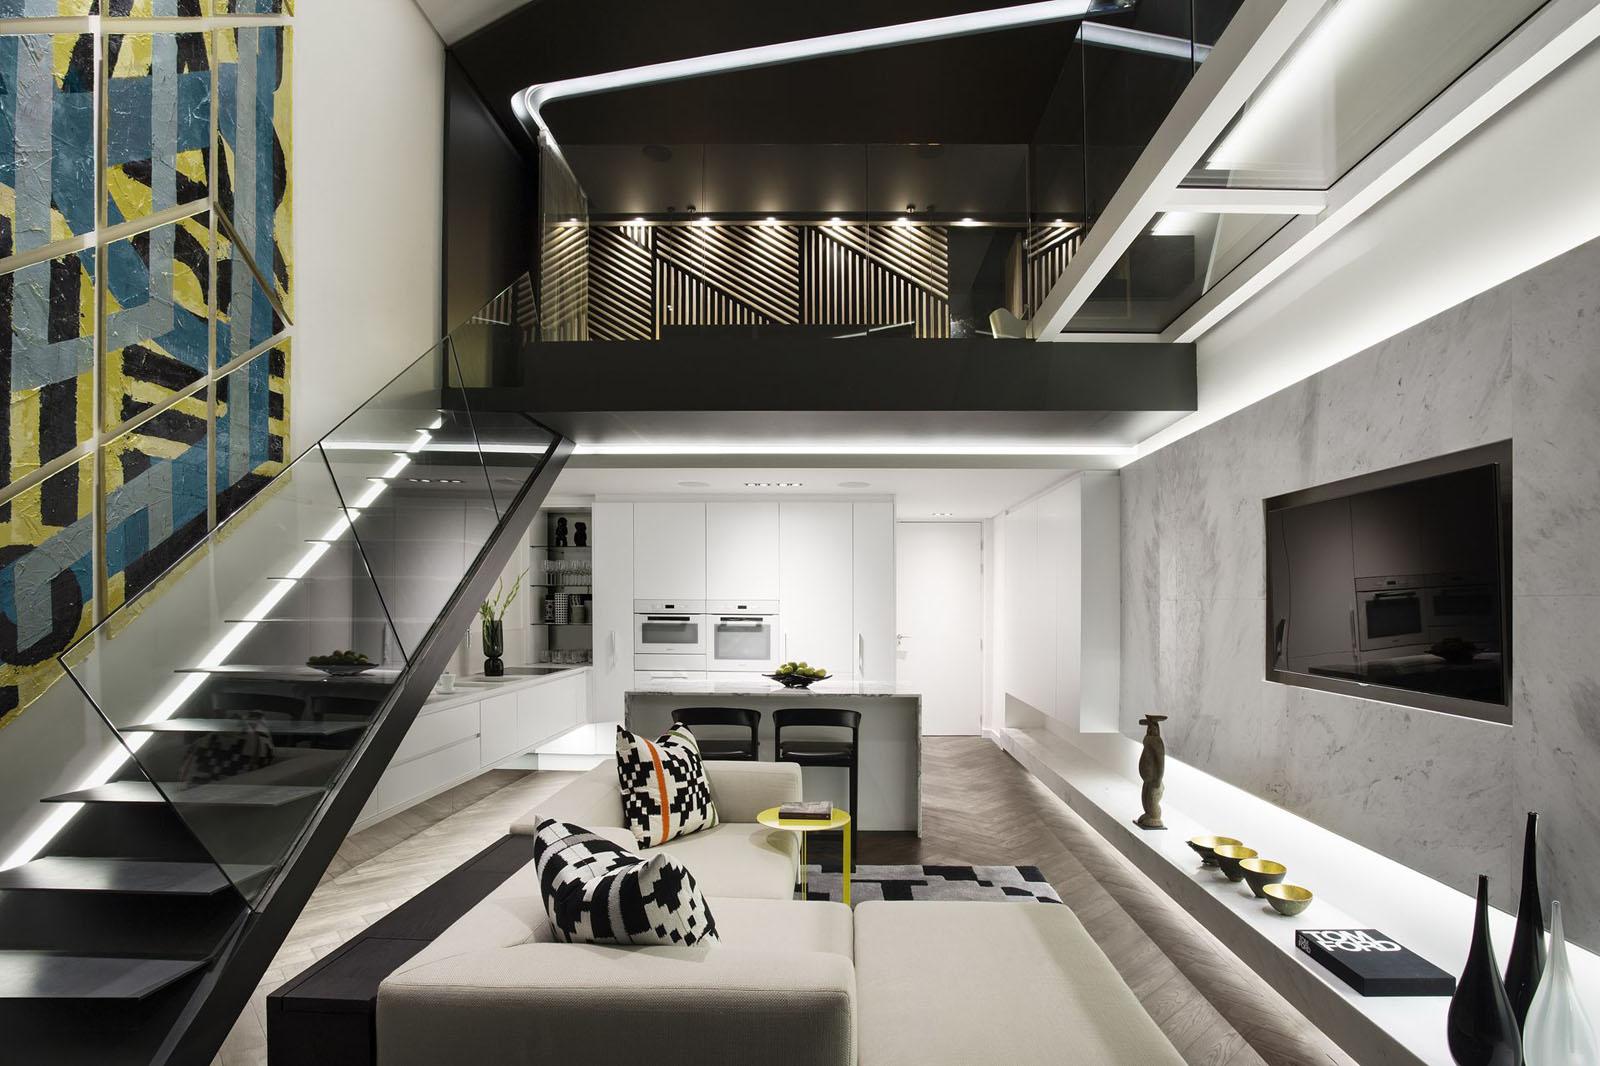 sofa warehouse cape town luxe trendy waterfront duplex penthouse apartment